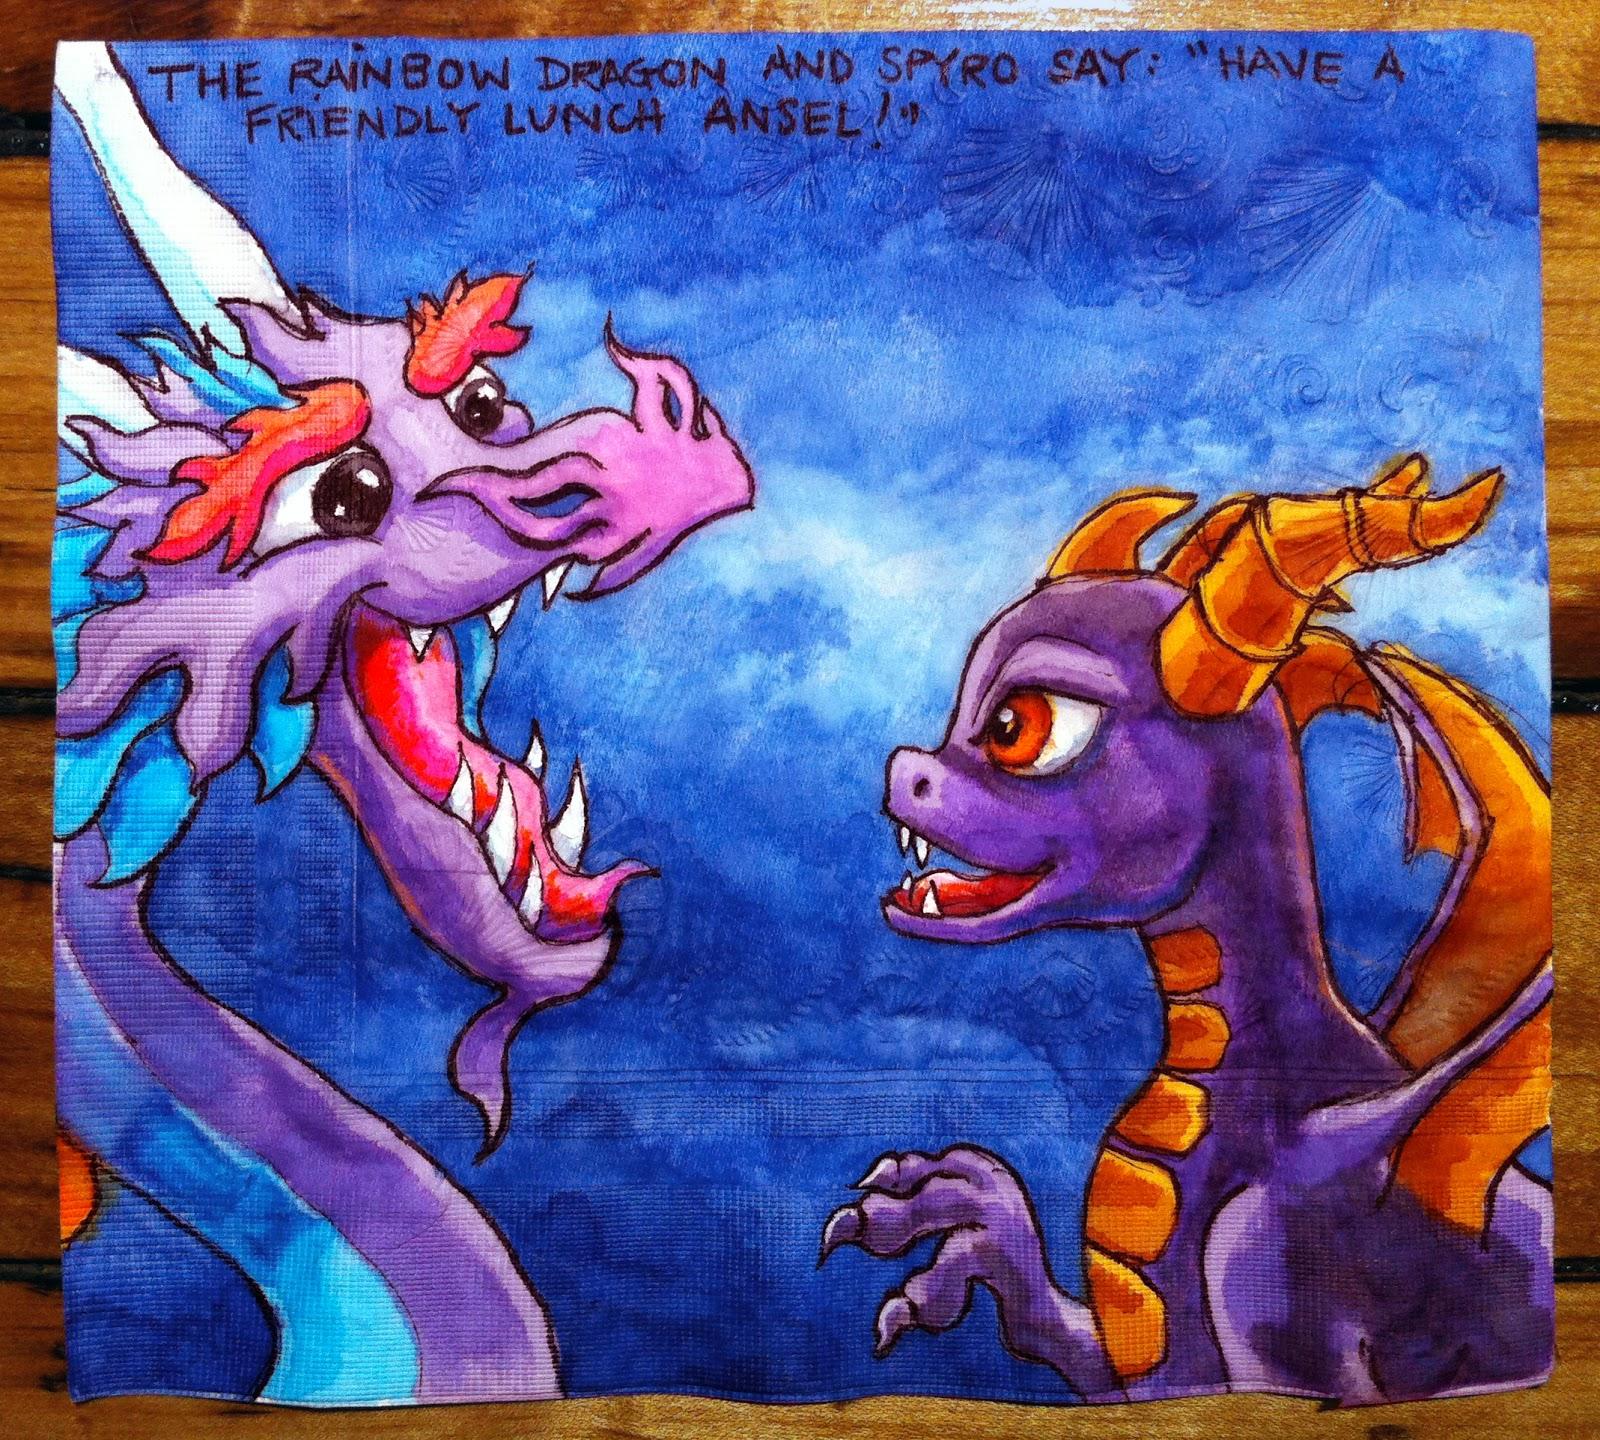 Daily Napkins Dragonvale Rainbow And Skylanders Spyro Dragons